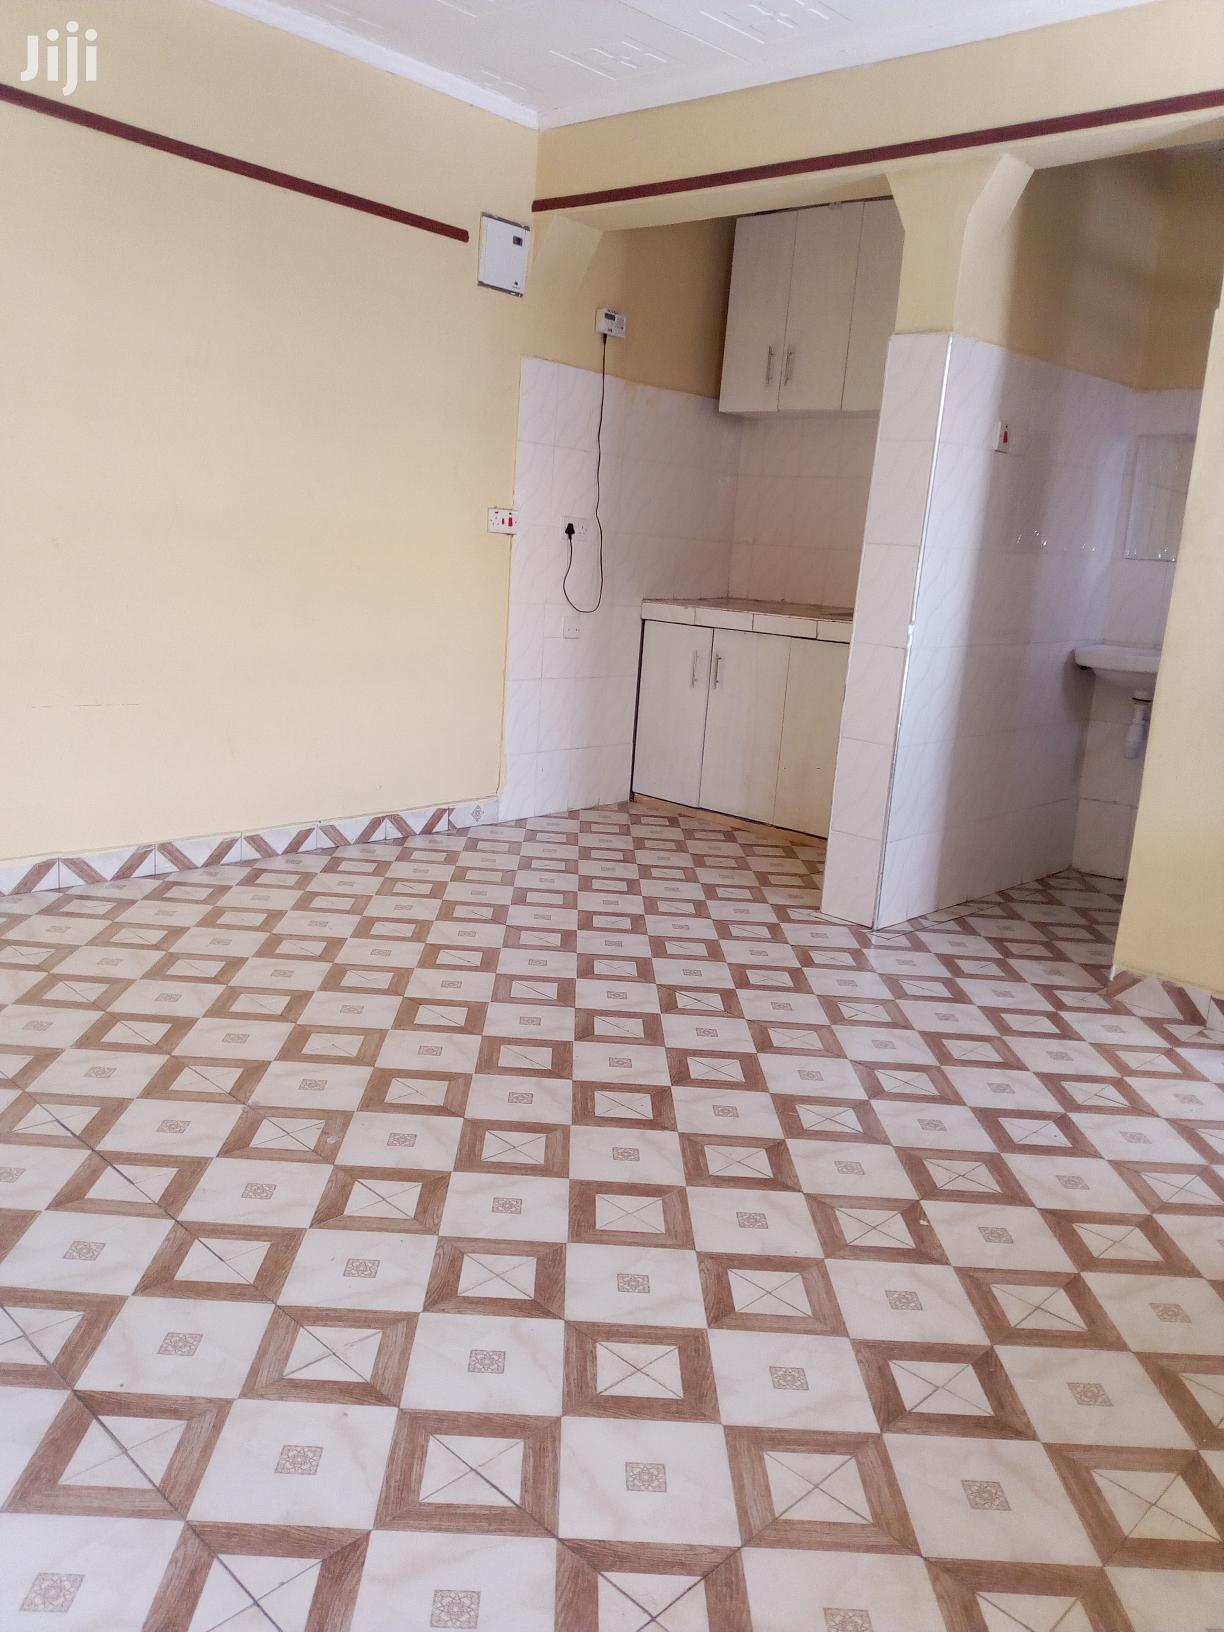 Letting Bedsitter Imara Daima   Houses & Apartments For Rent for sale in Imara Daima, Nairobi, Kenya